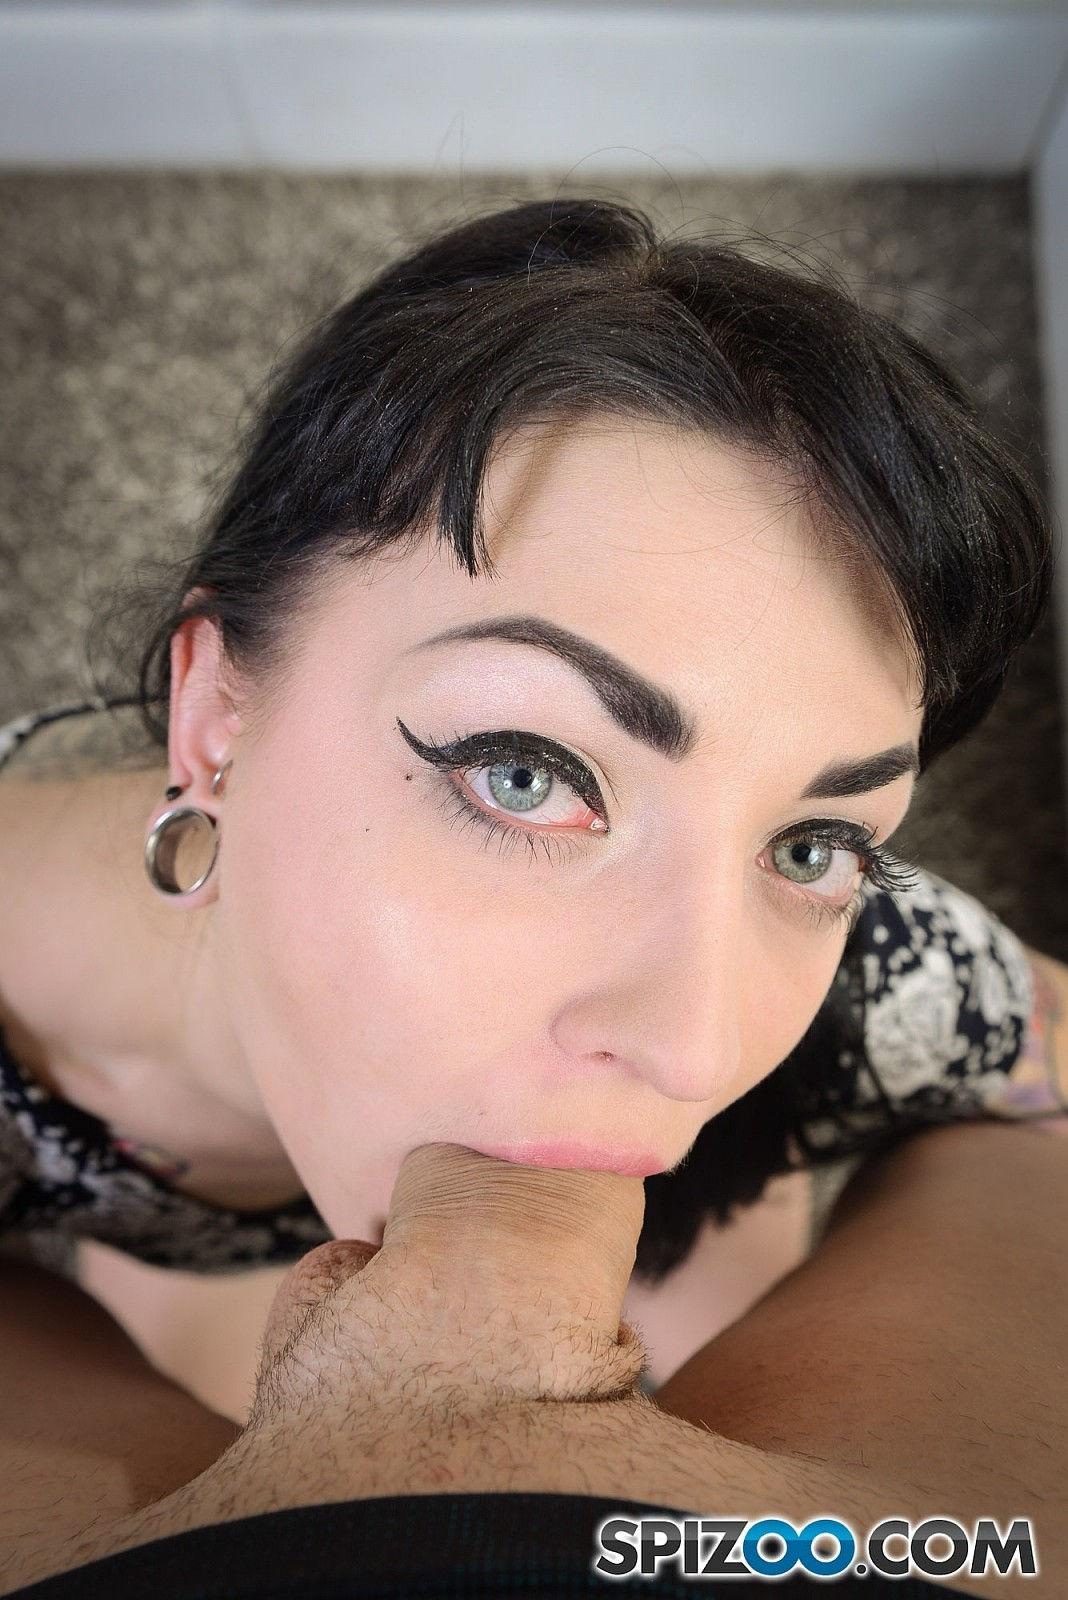 Gothic pornstar Draven Star deep throat blowjob in a free Spizoo sex gallery